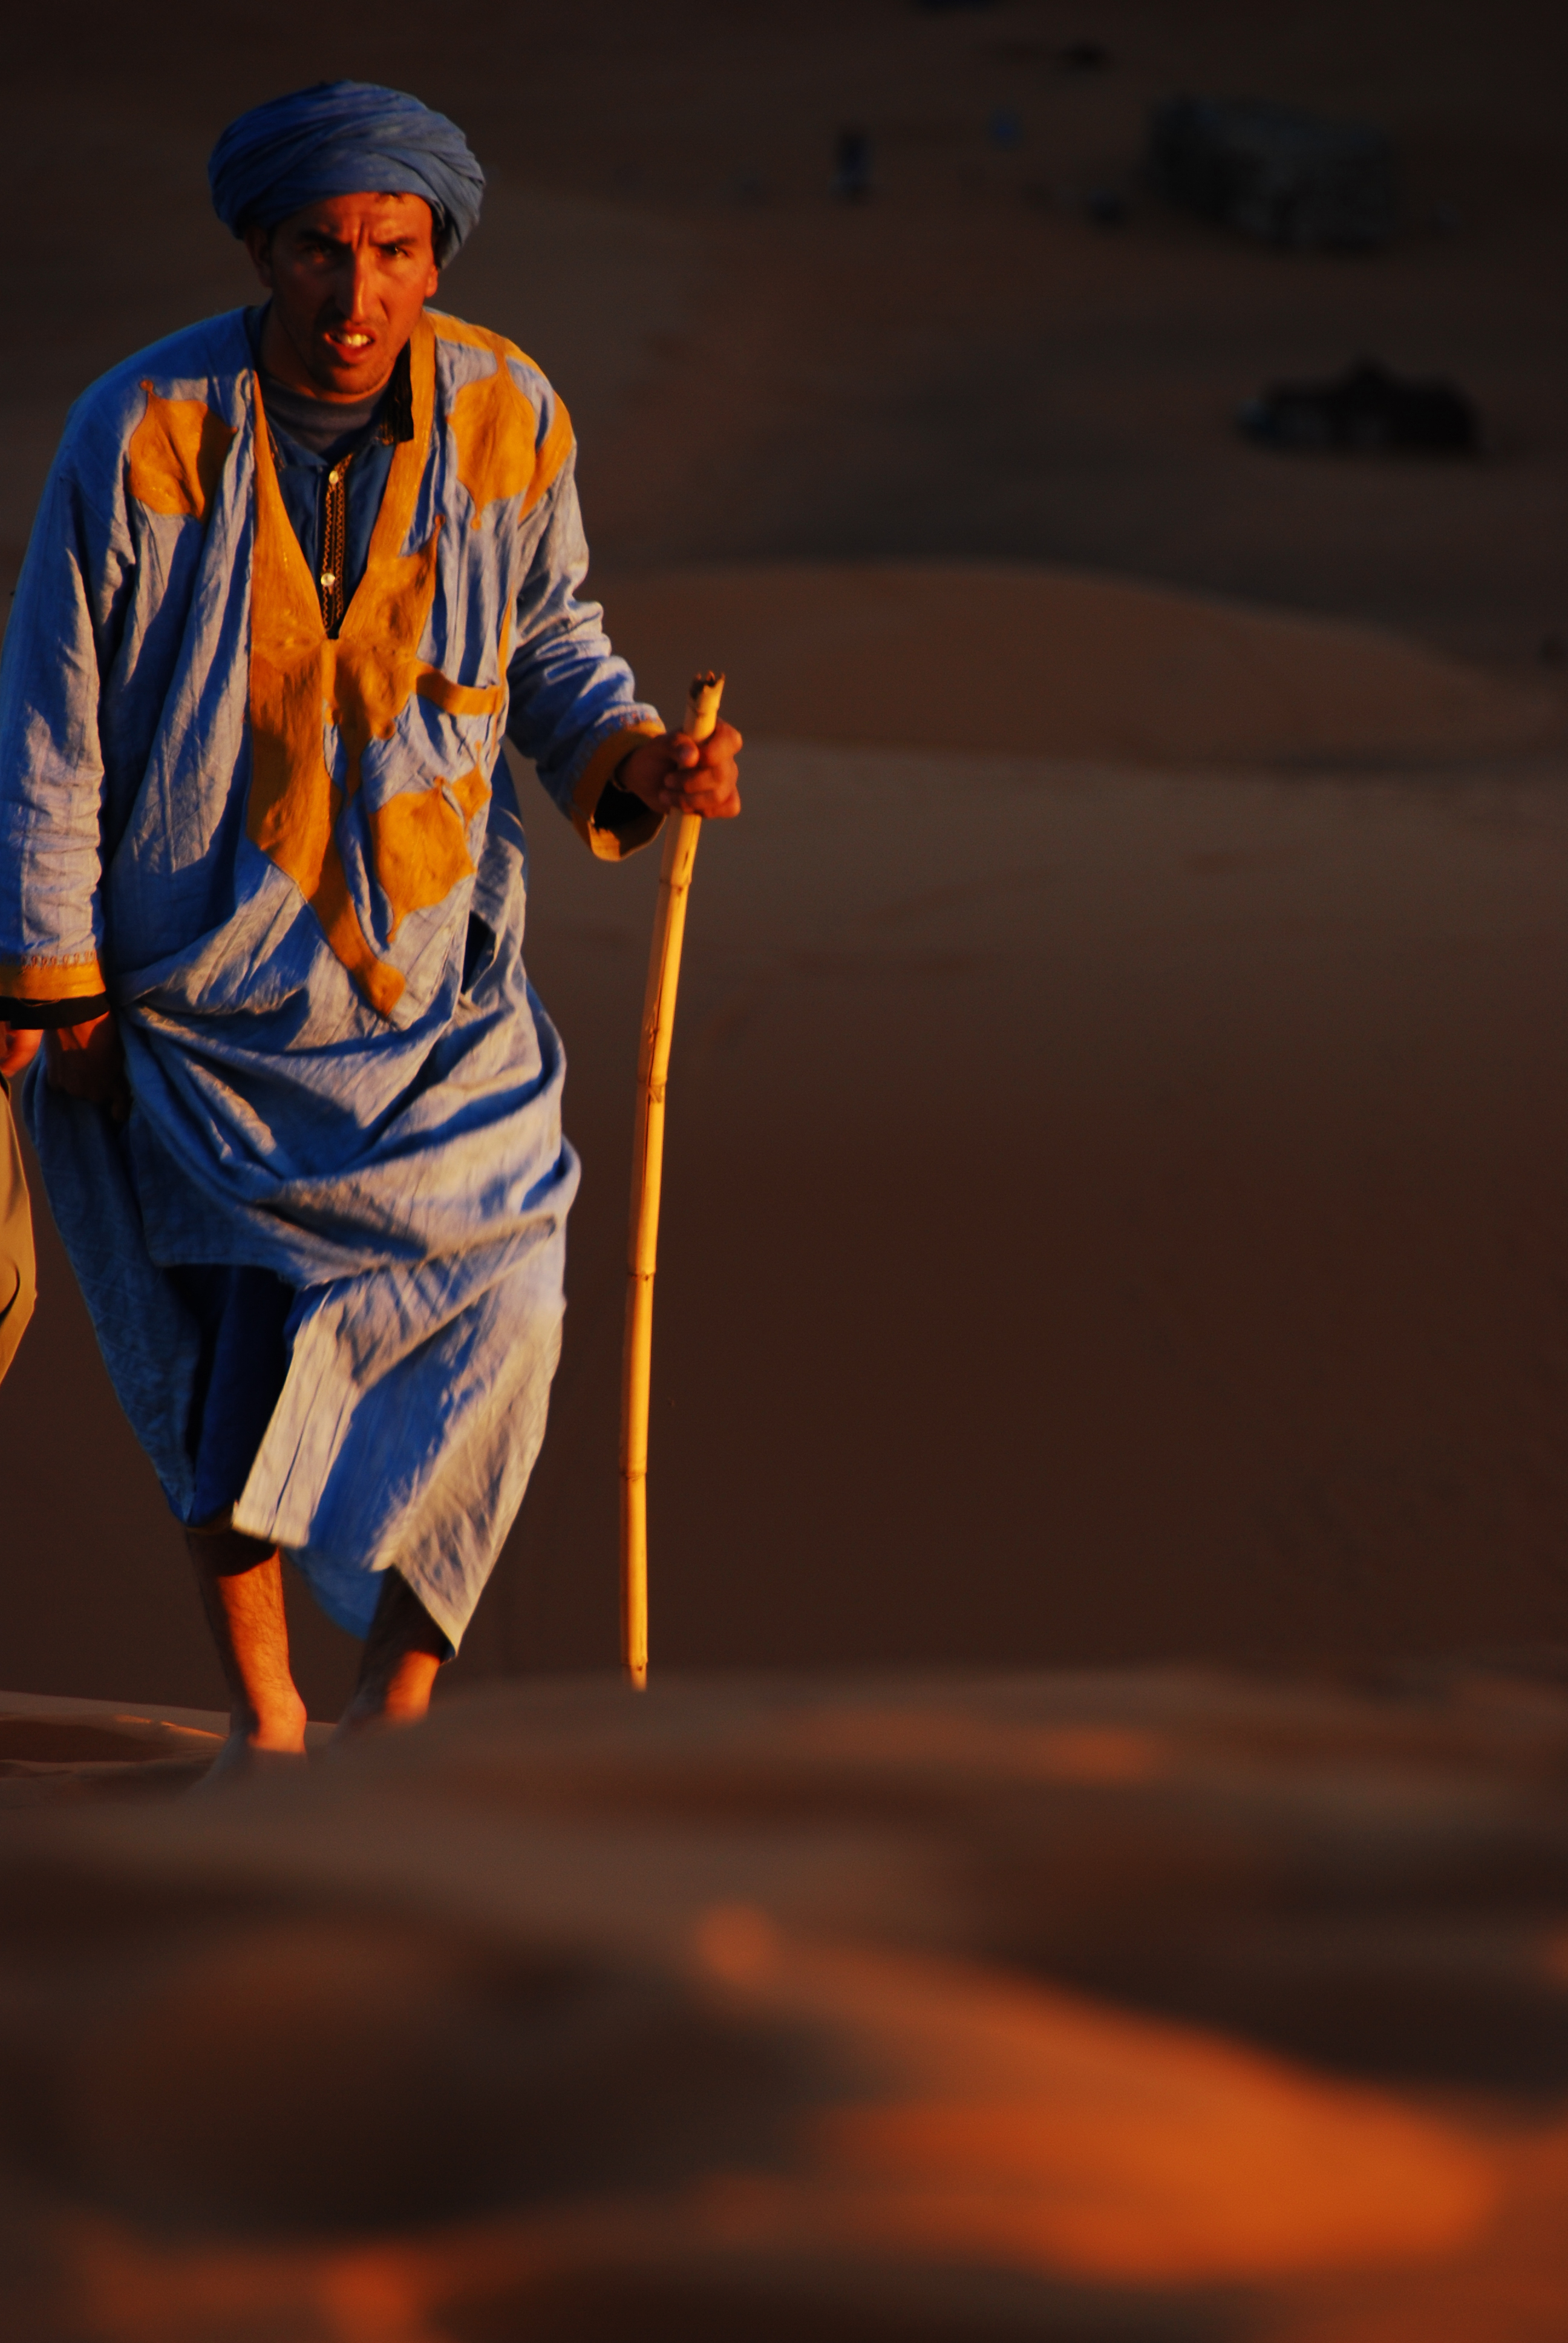 Marocco-0123.jpg